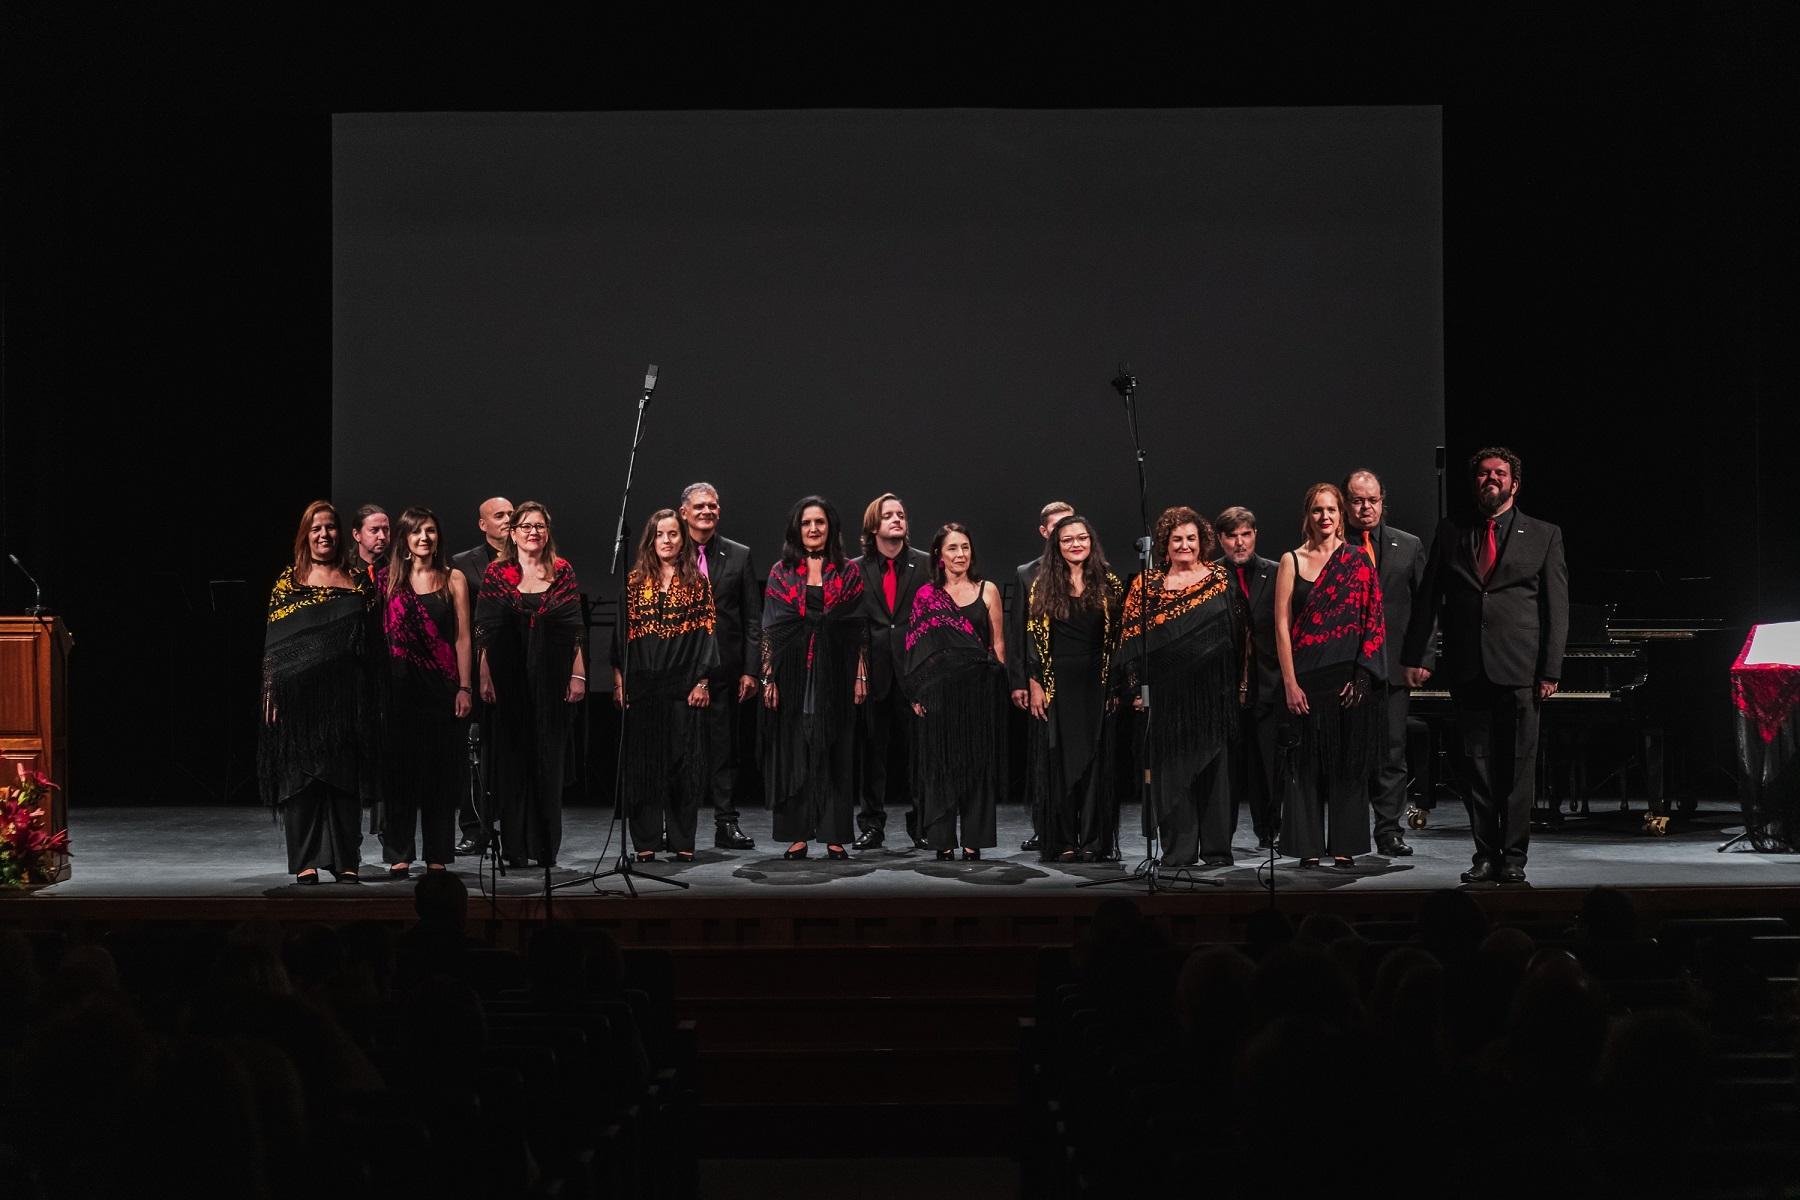 Música, Camerata Lacunensis